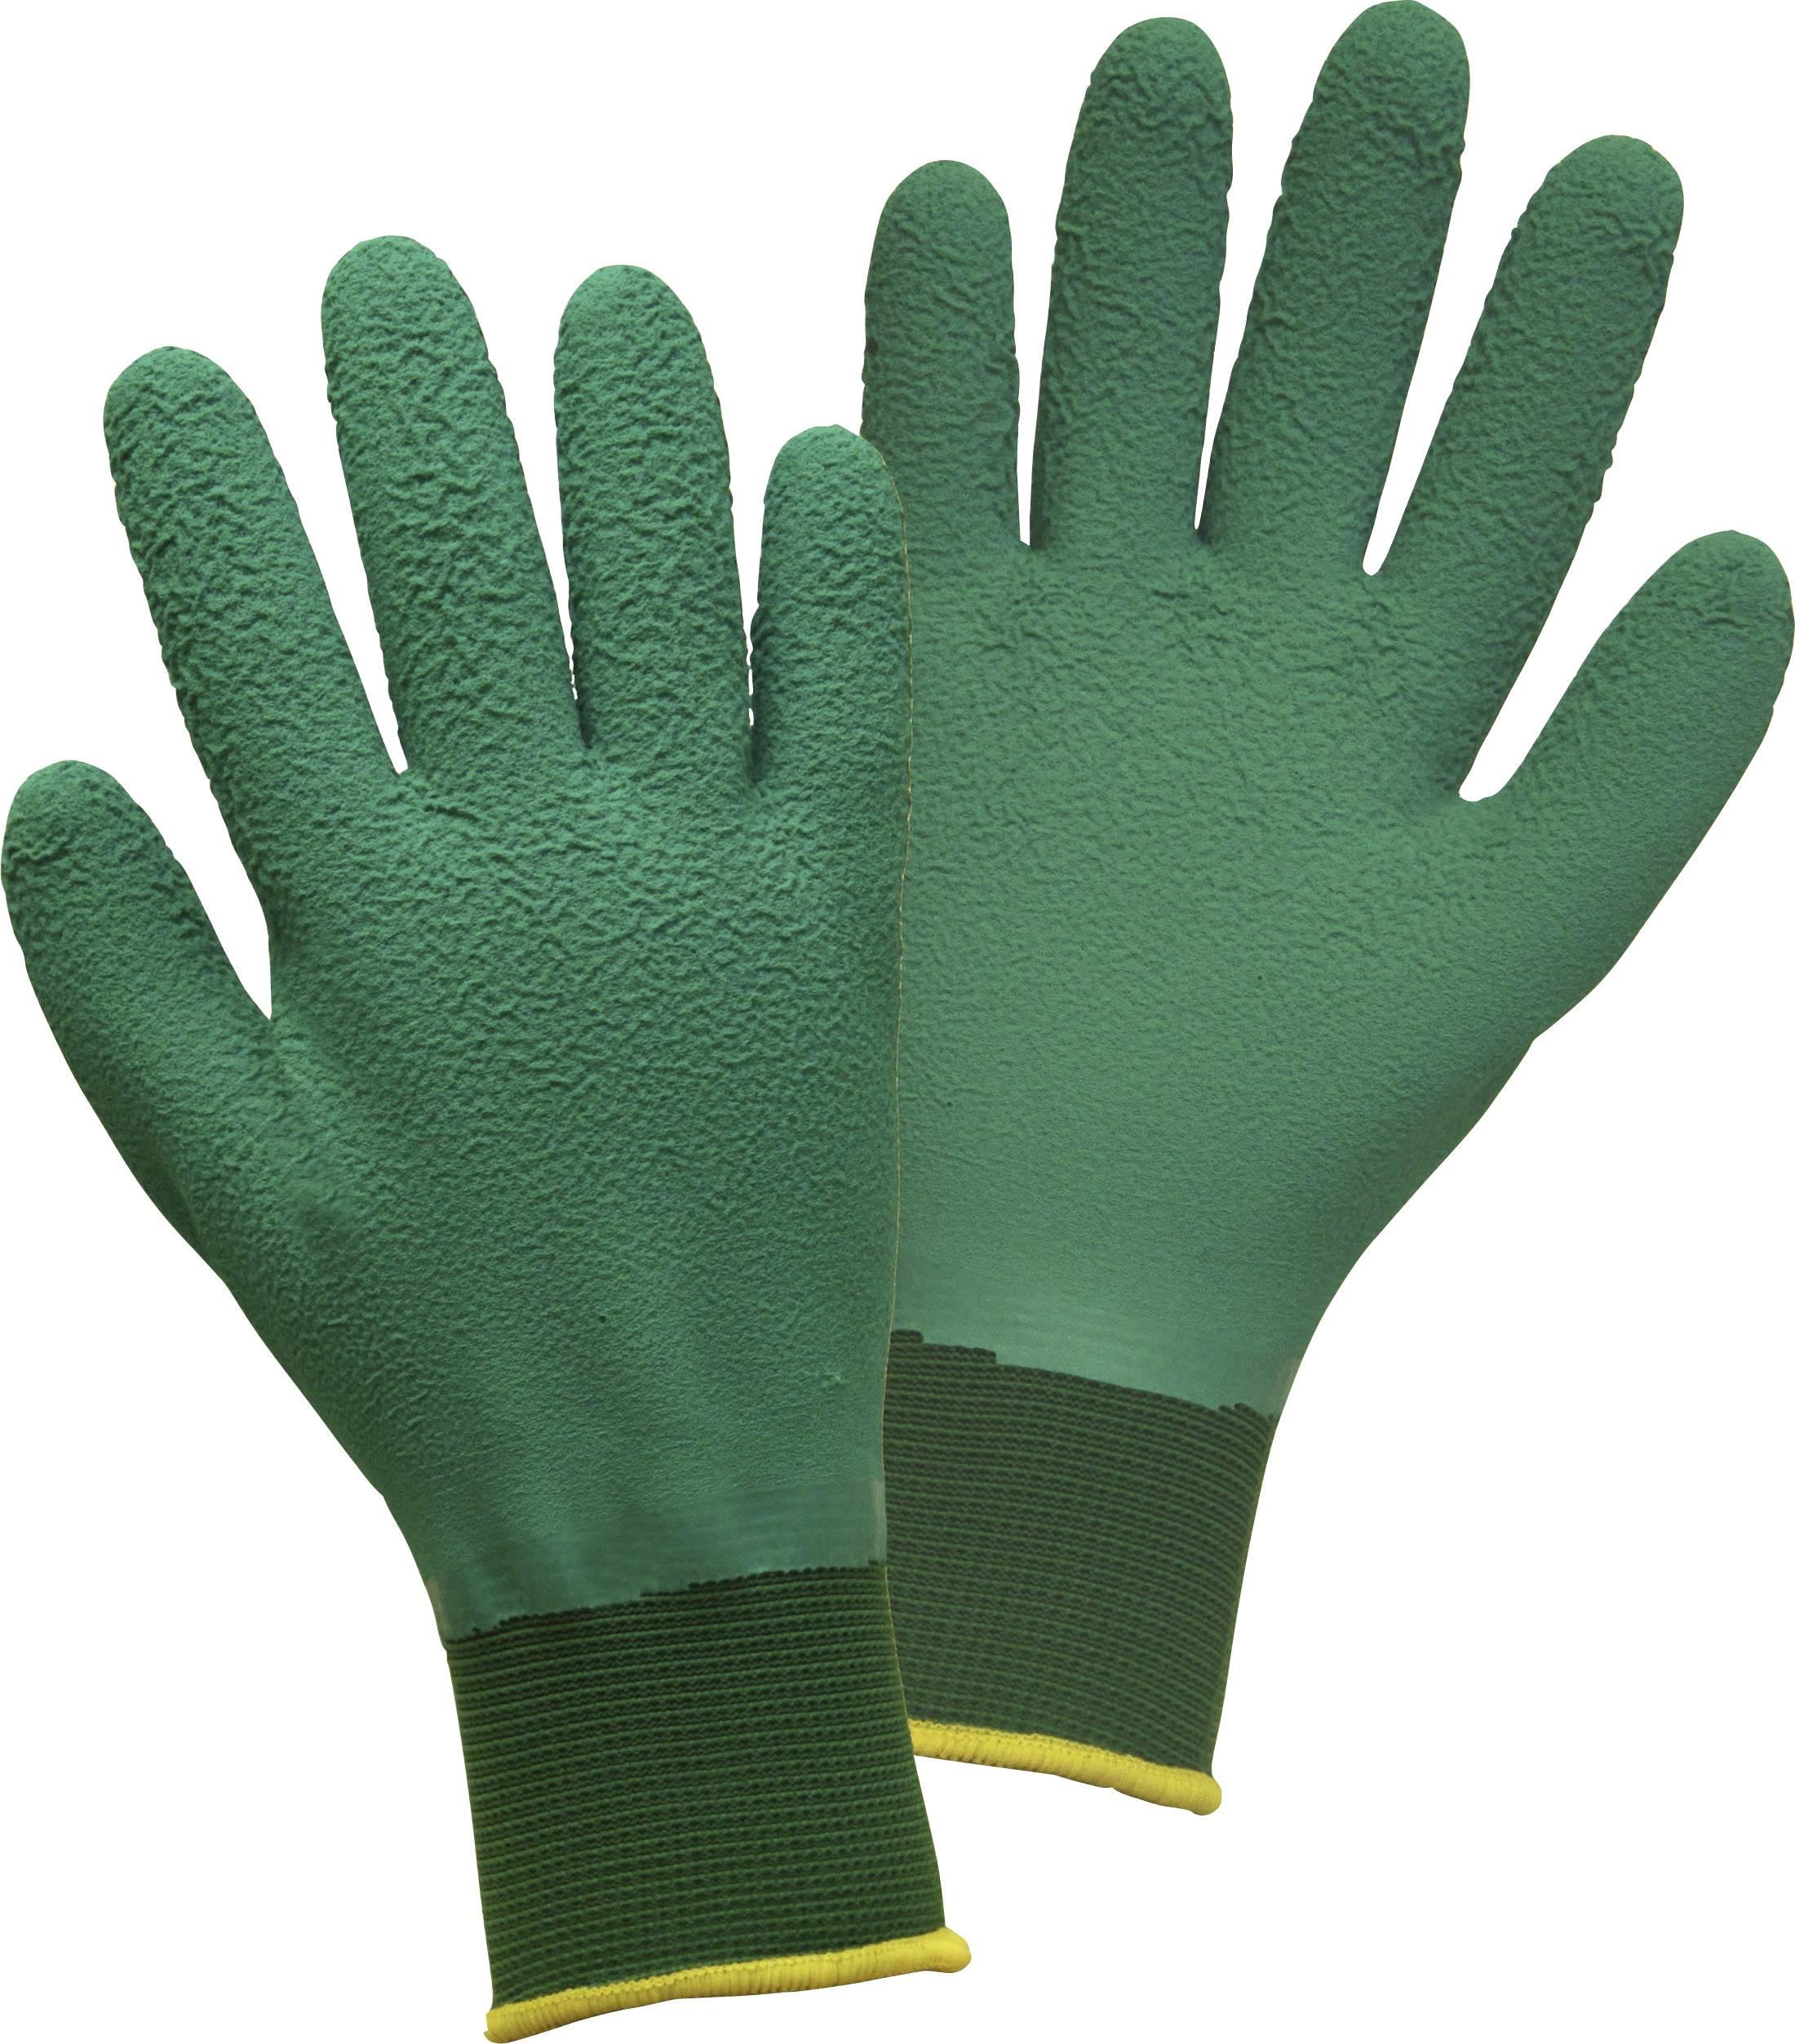 Zahradní rukavice FerdyF. Rosalind Garten 1494, velikost rukavic: 10, XL